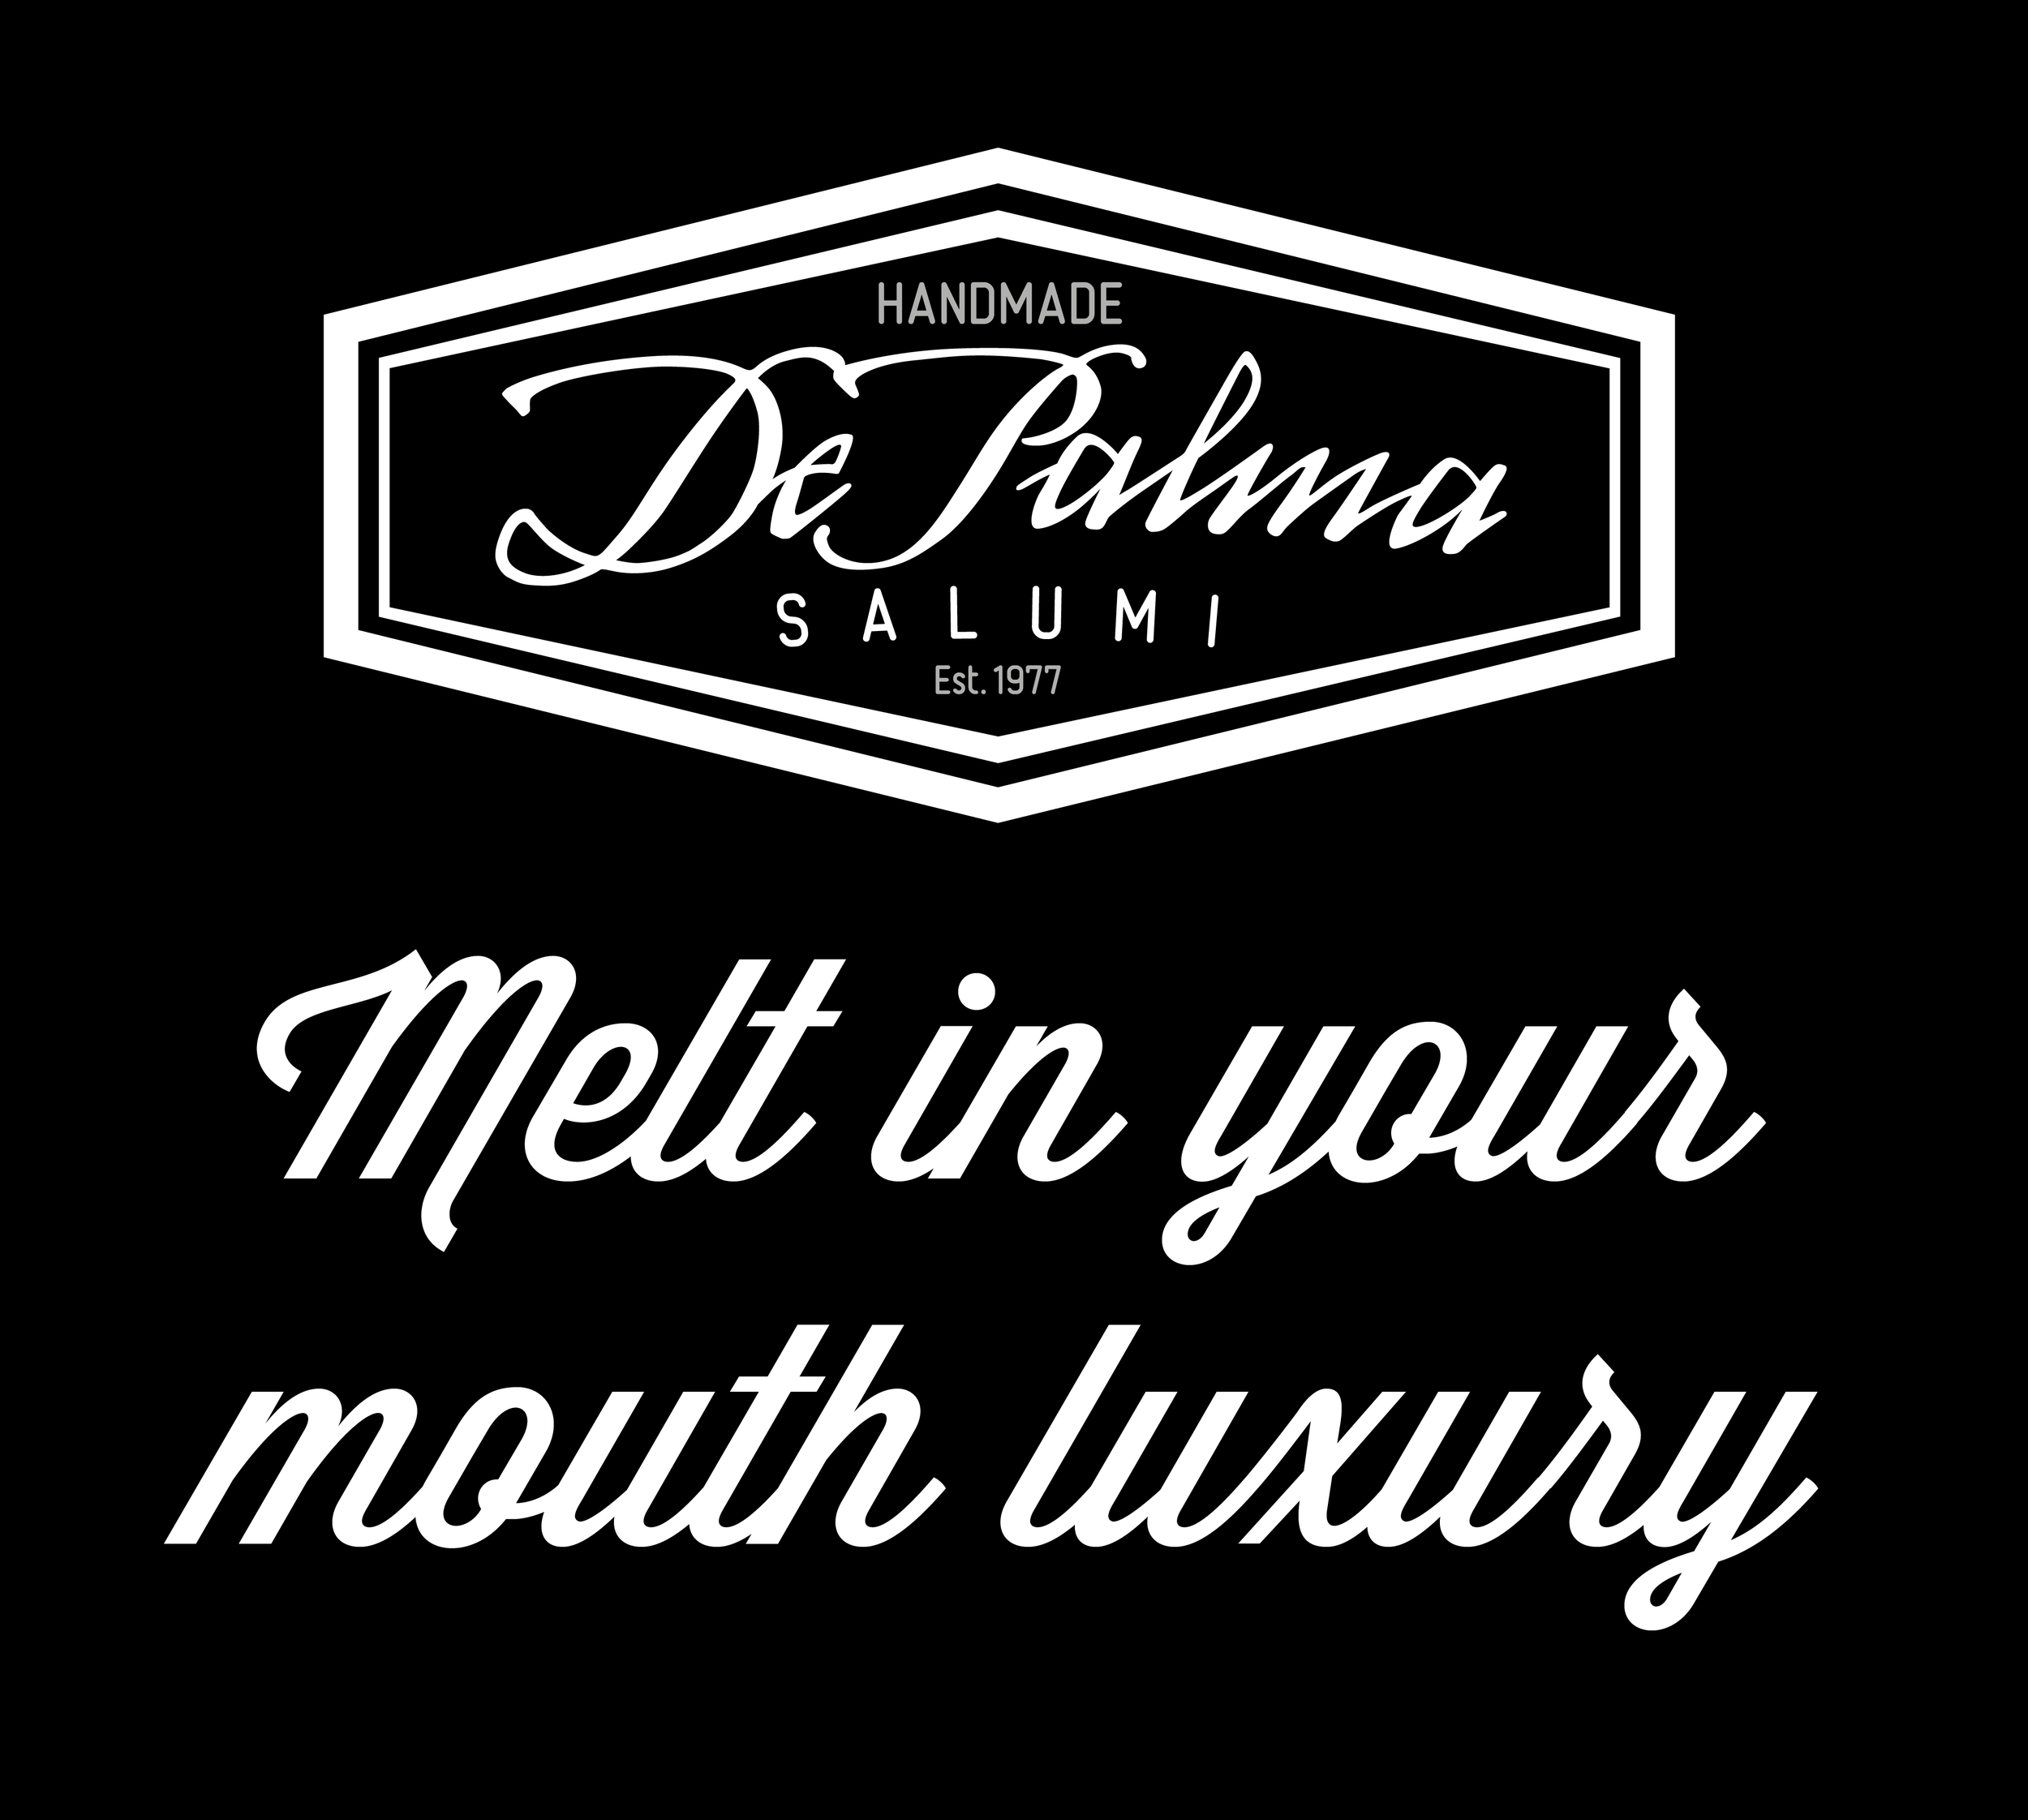 DePalma_MeltinmouthLuxury.jpg